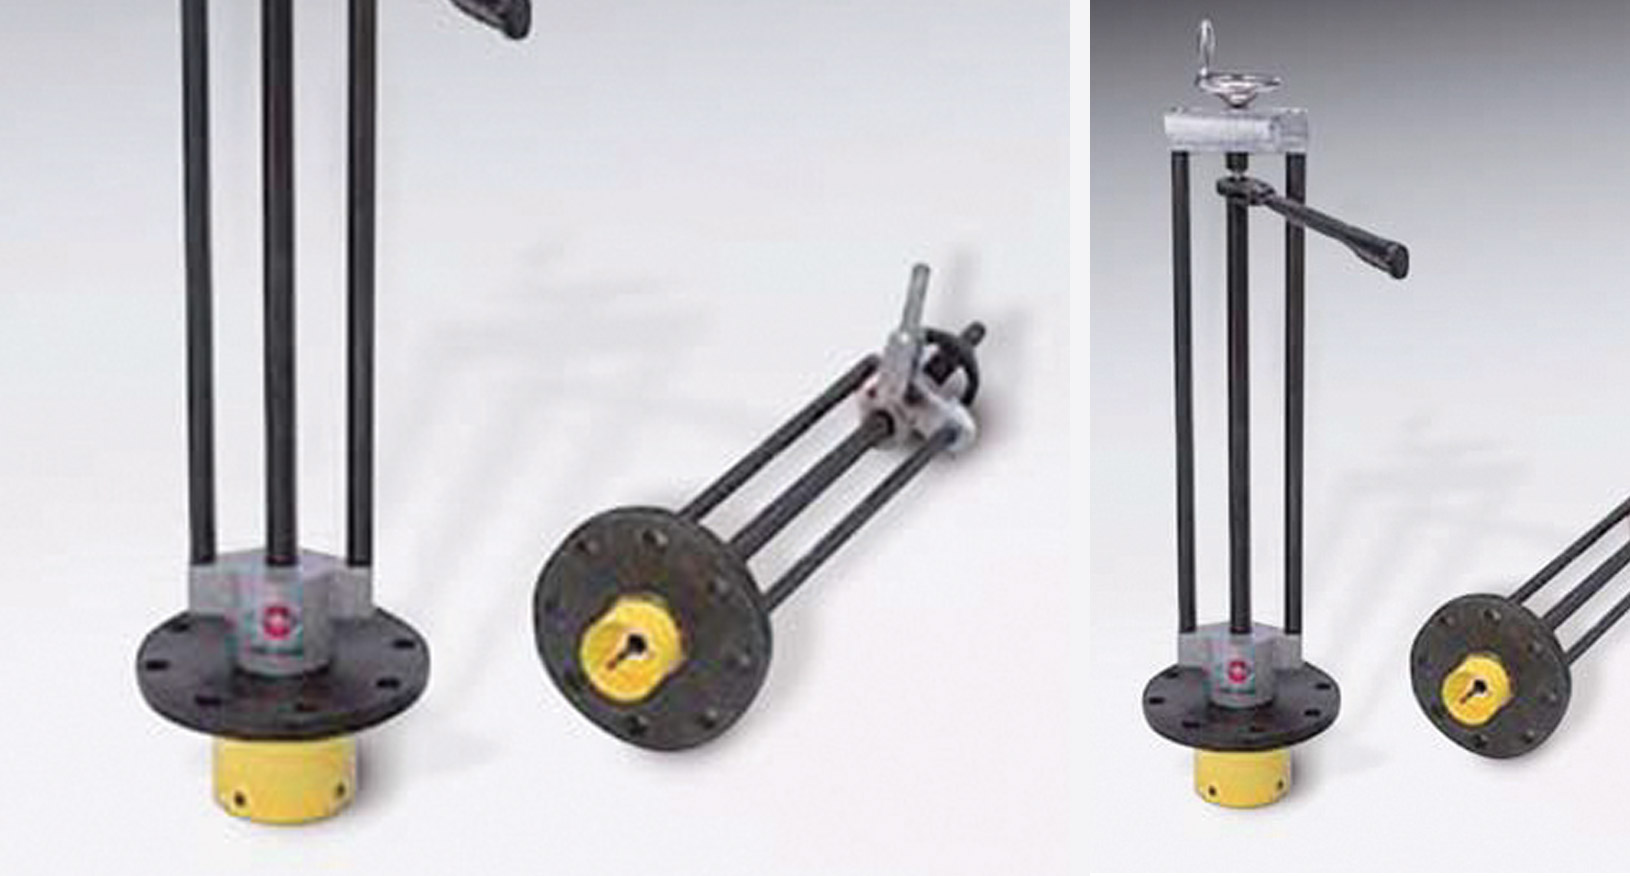 Compact 4 Under Pressure Drill